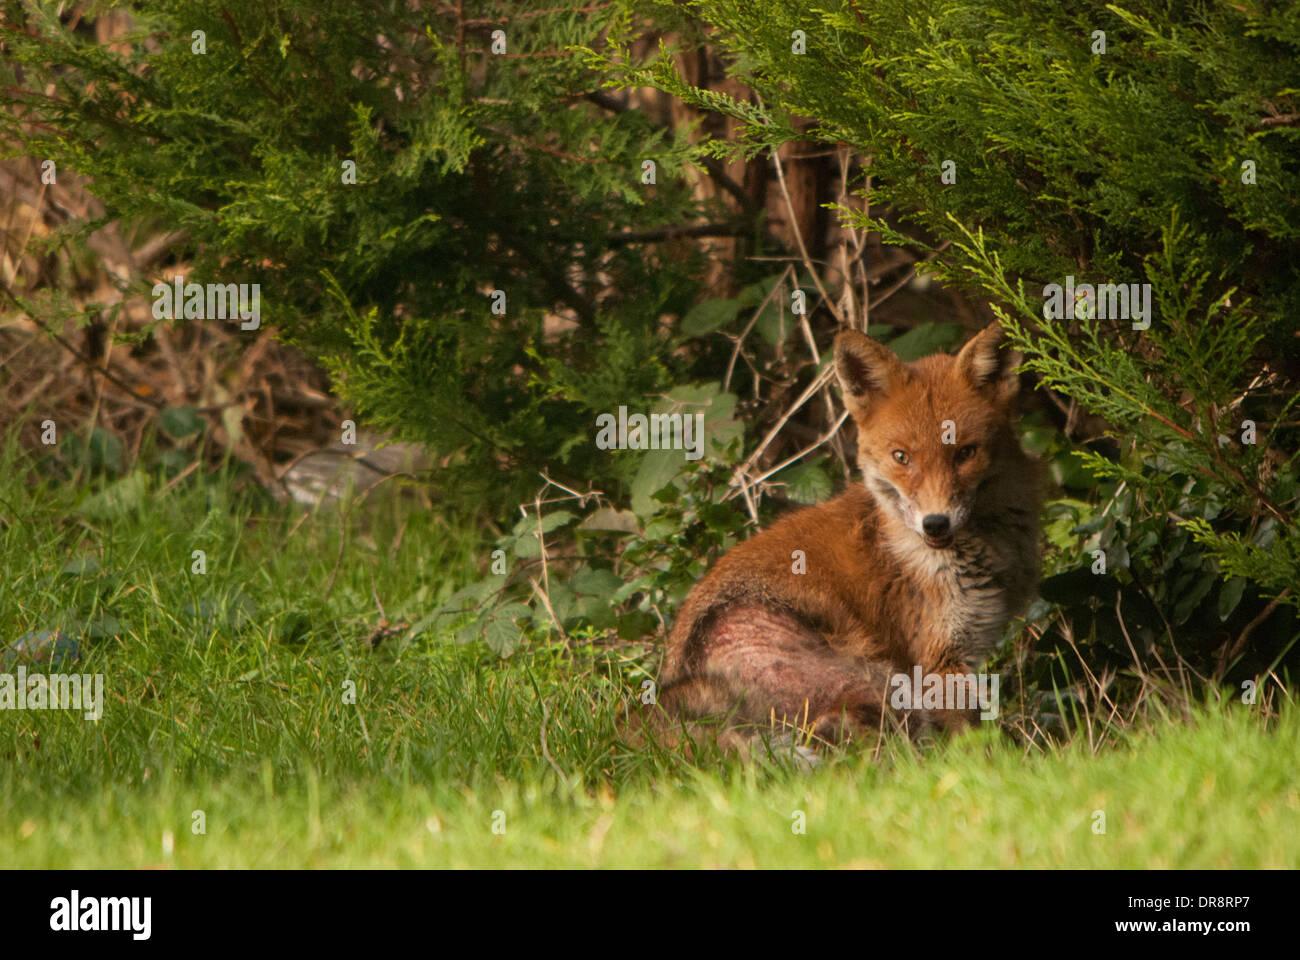 Fox looking at camera (Vulpes vulpes); skin affliction in a back garden. - Stock Image